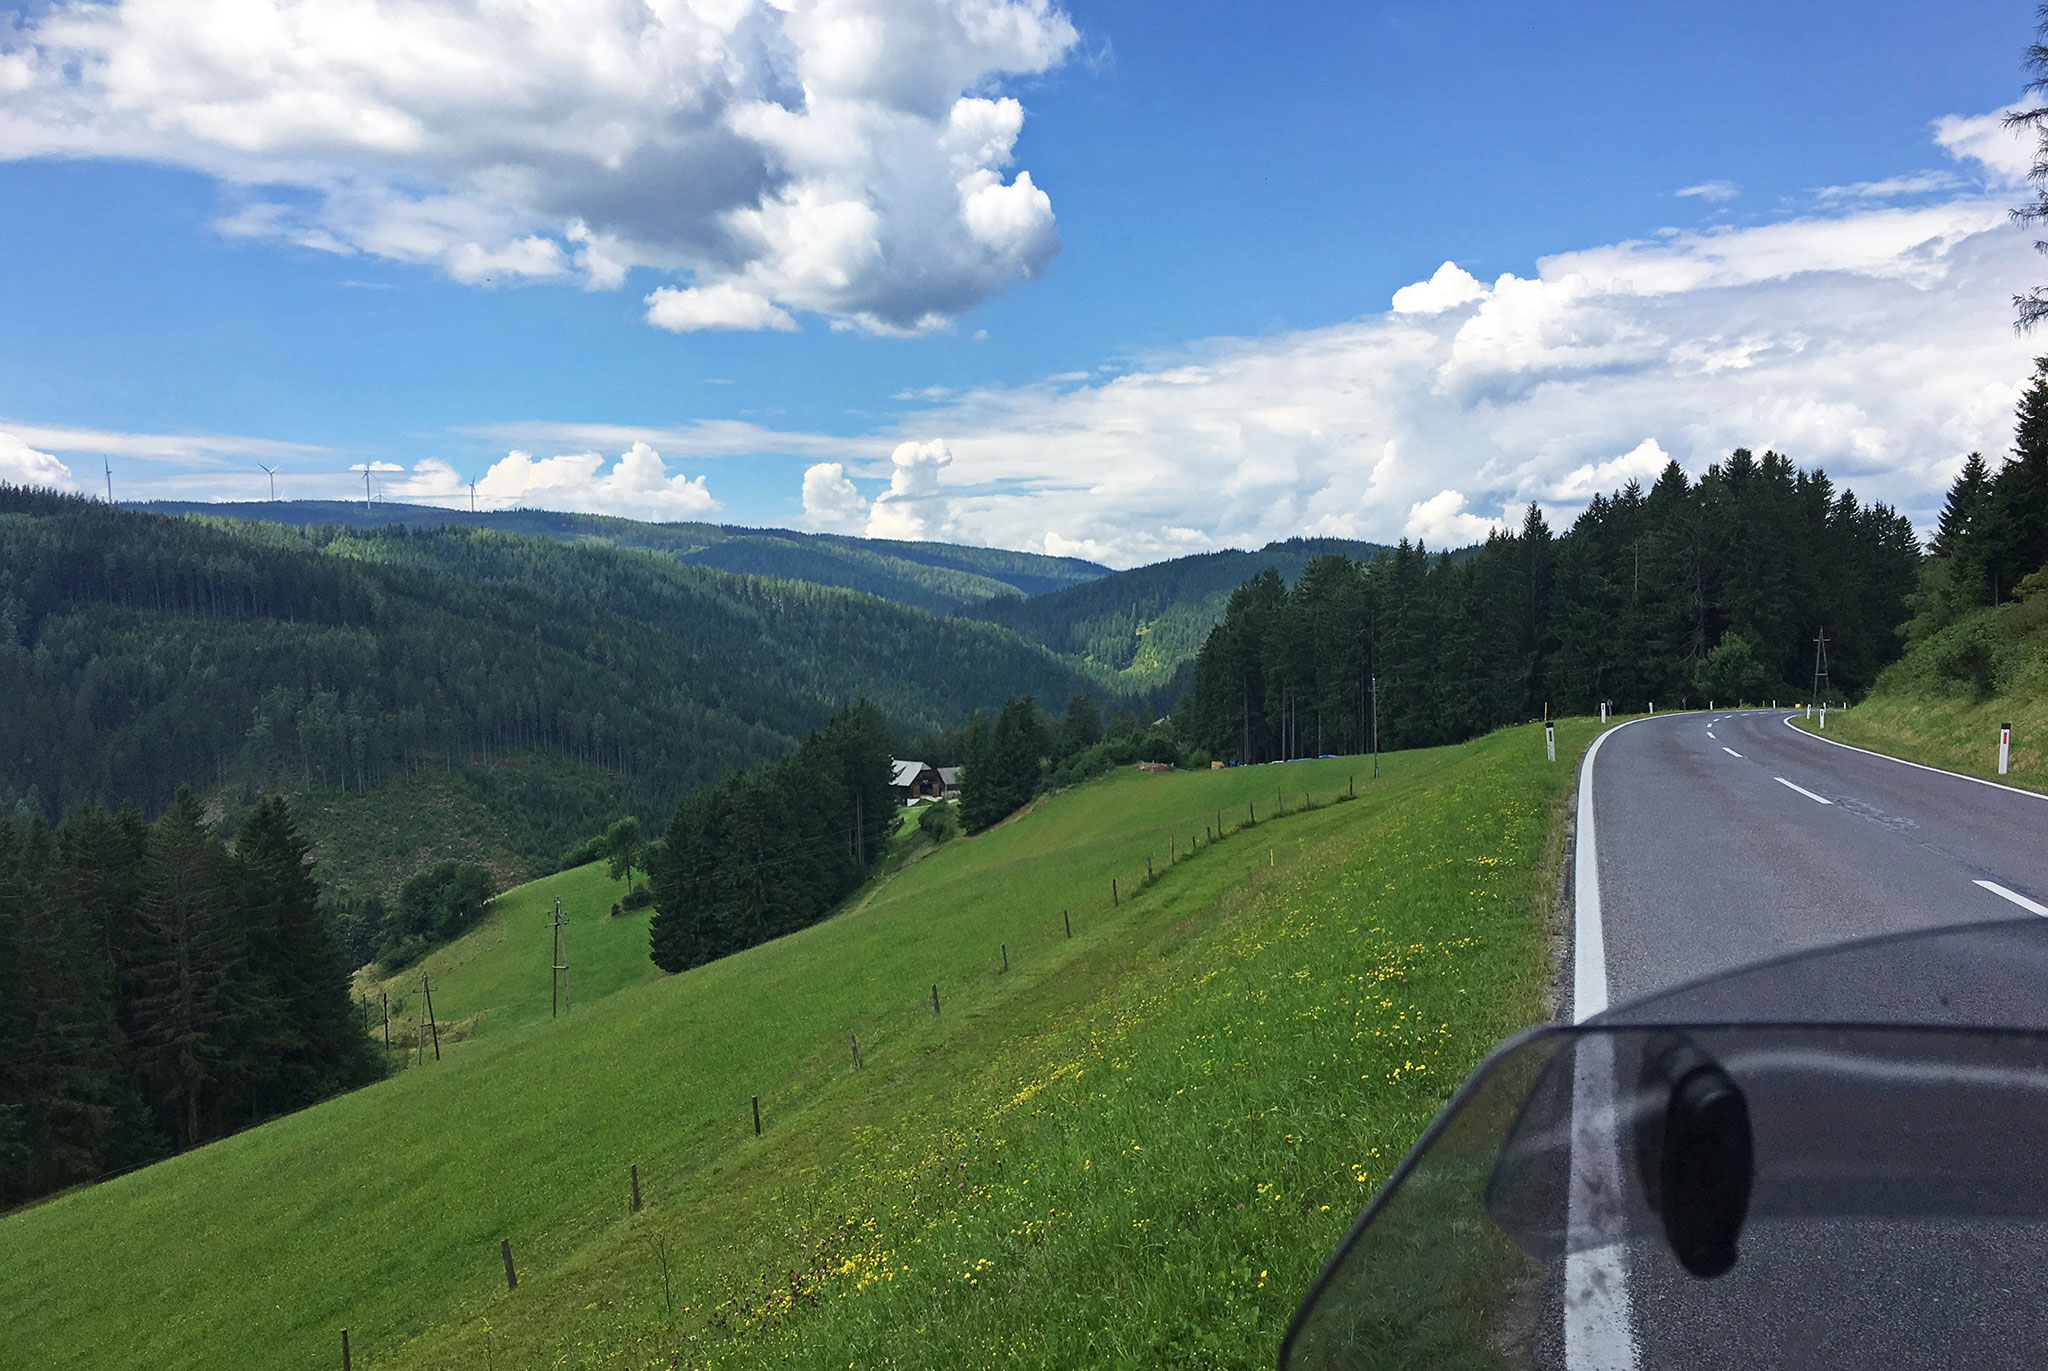 Austrian roads & countryside